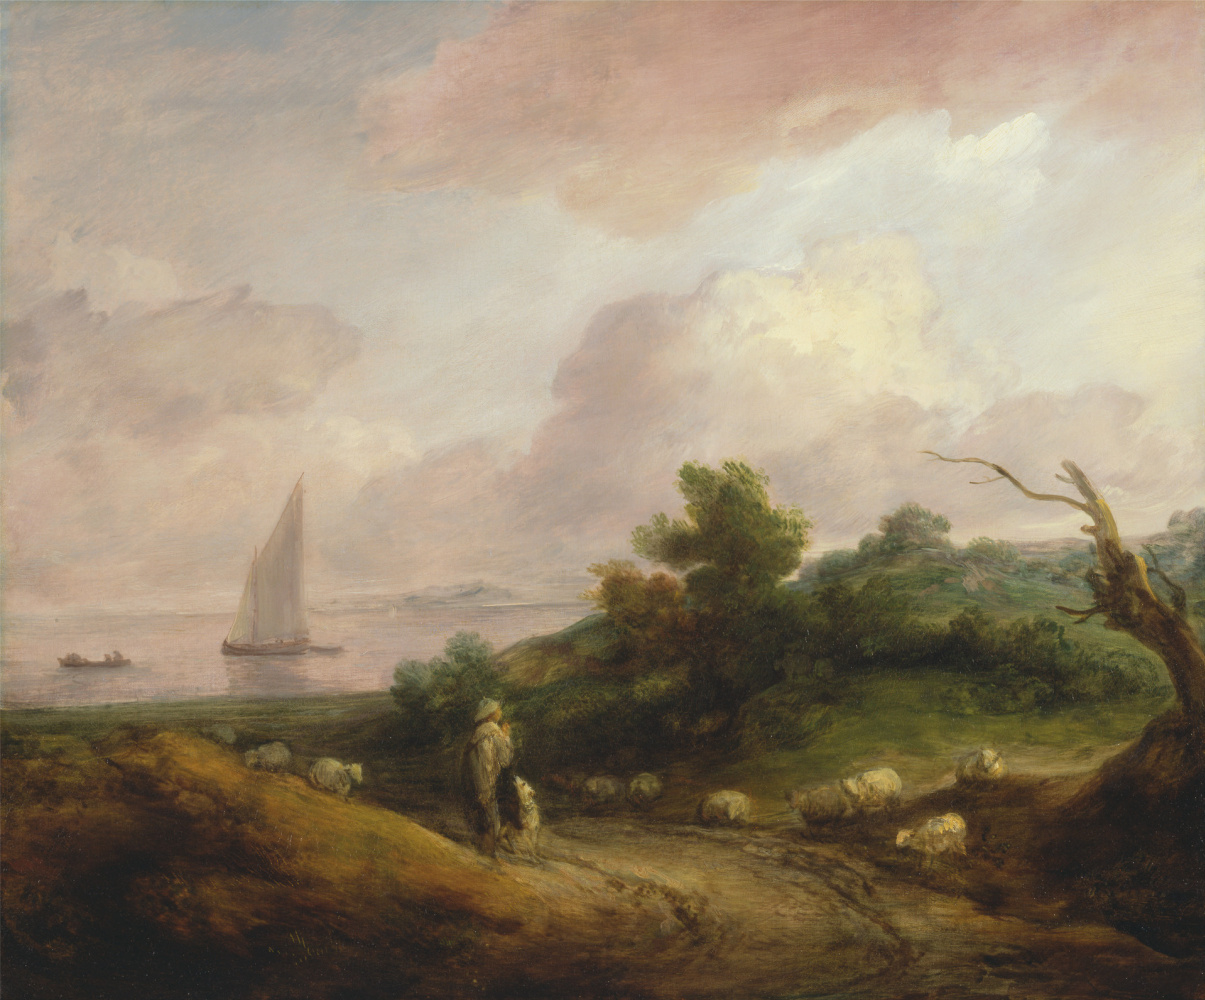 Thomas Gainsborough. Coastal landscape with a shepherd and his flock